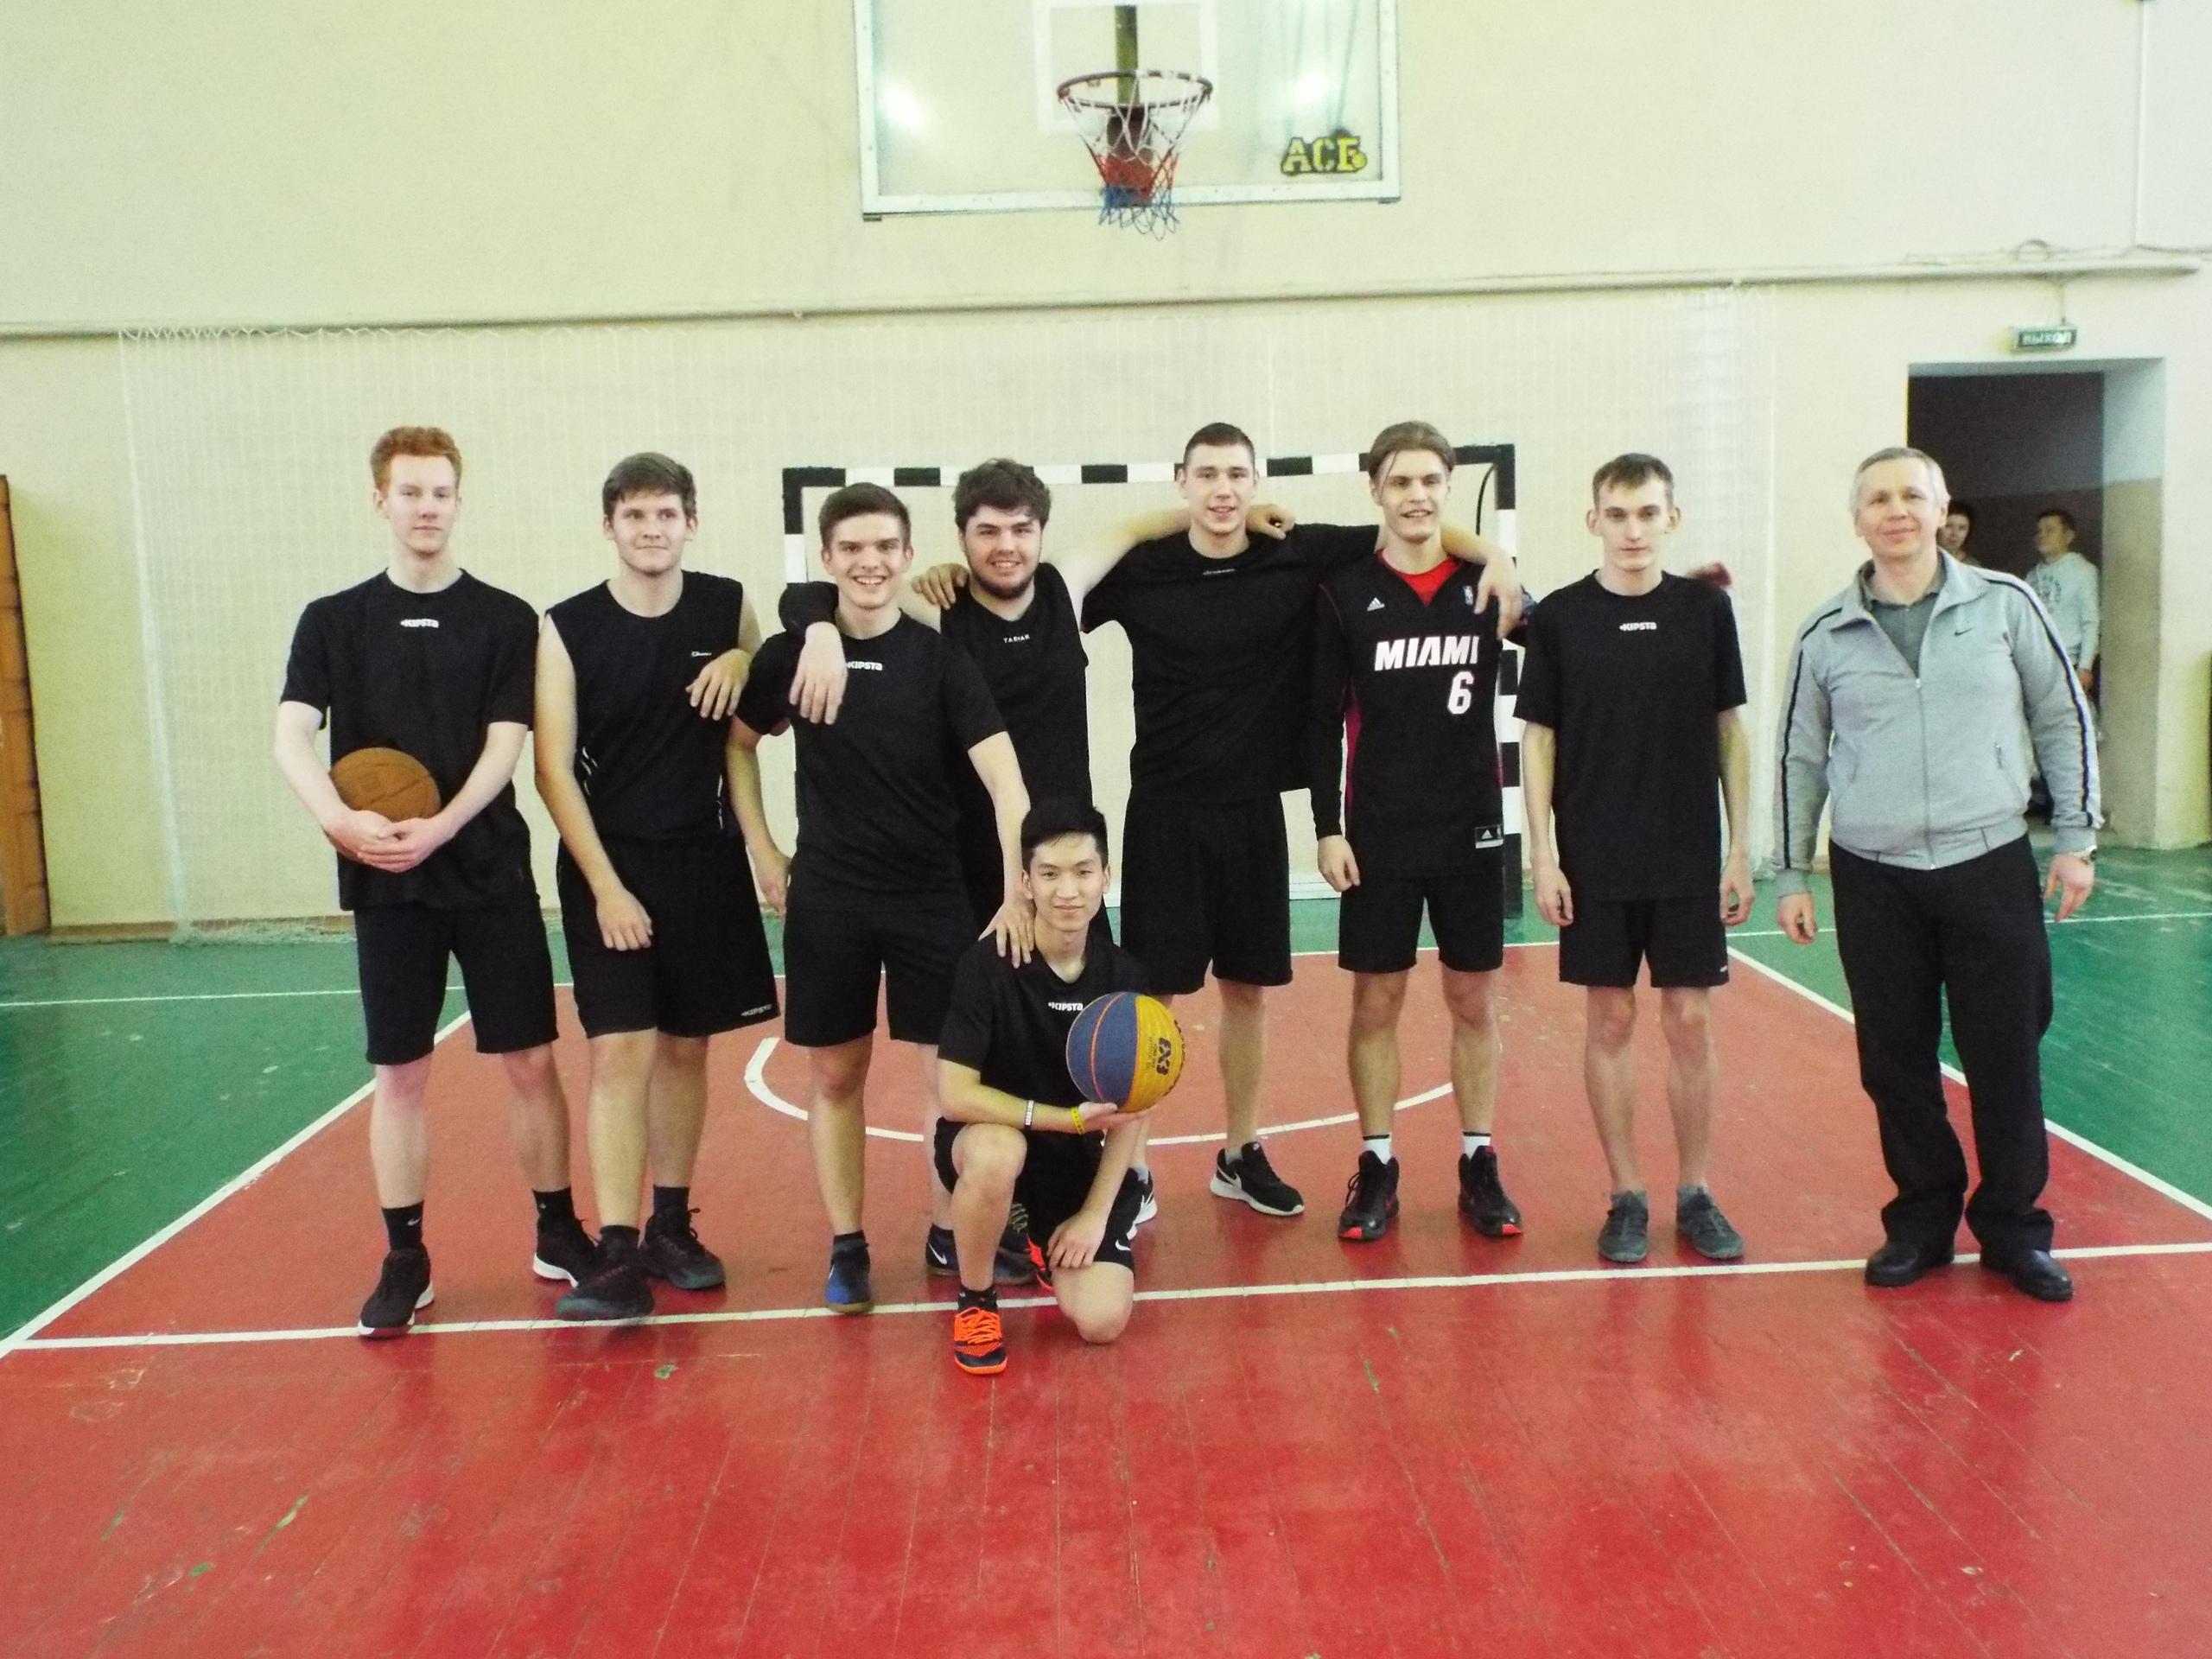 Открытый Чемпионат по баскетболу среди мужских команд